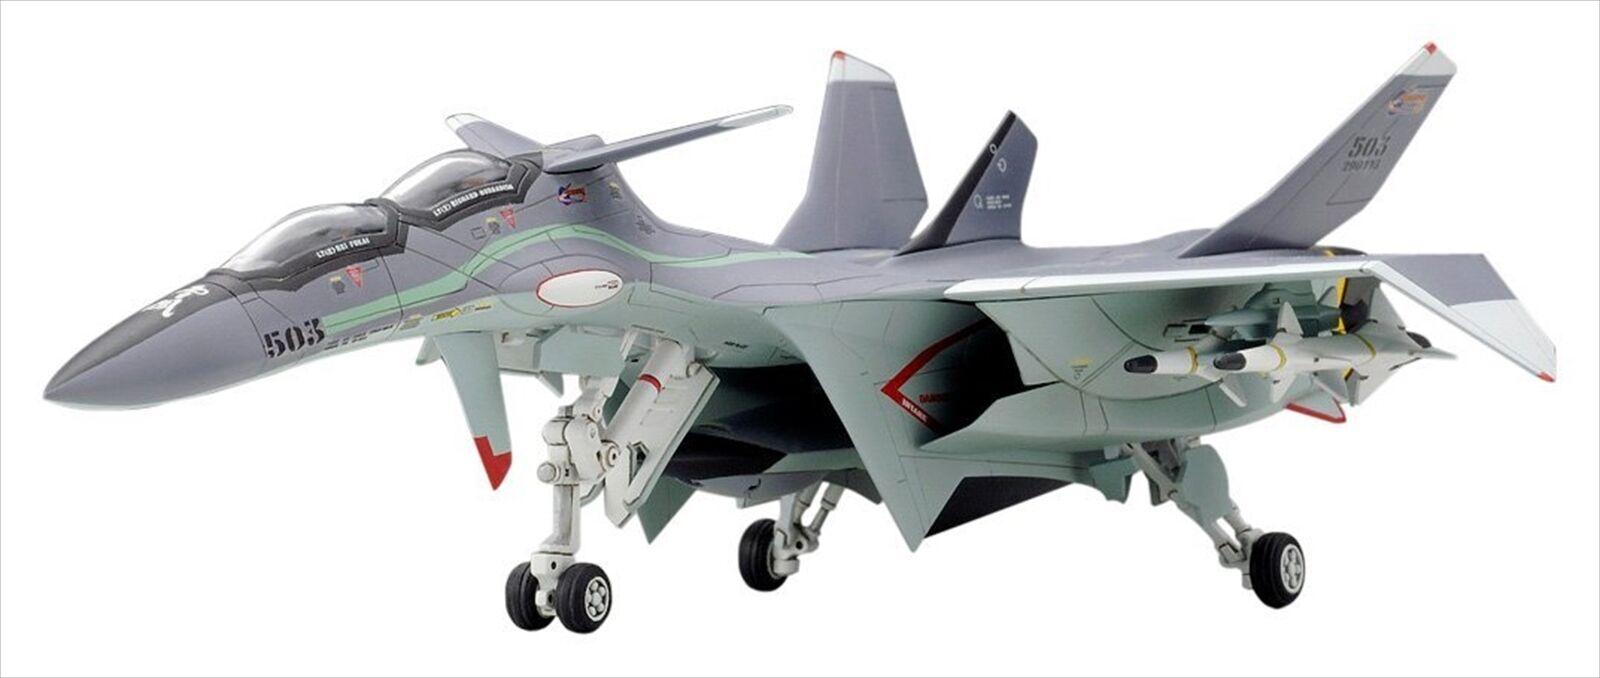 Alter Yukikaze Super Gnomo FFR-31 Mr D 1 100 Escala Figura De Acción